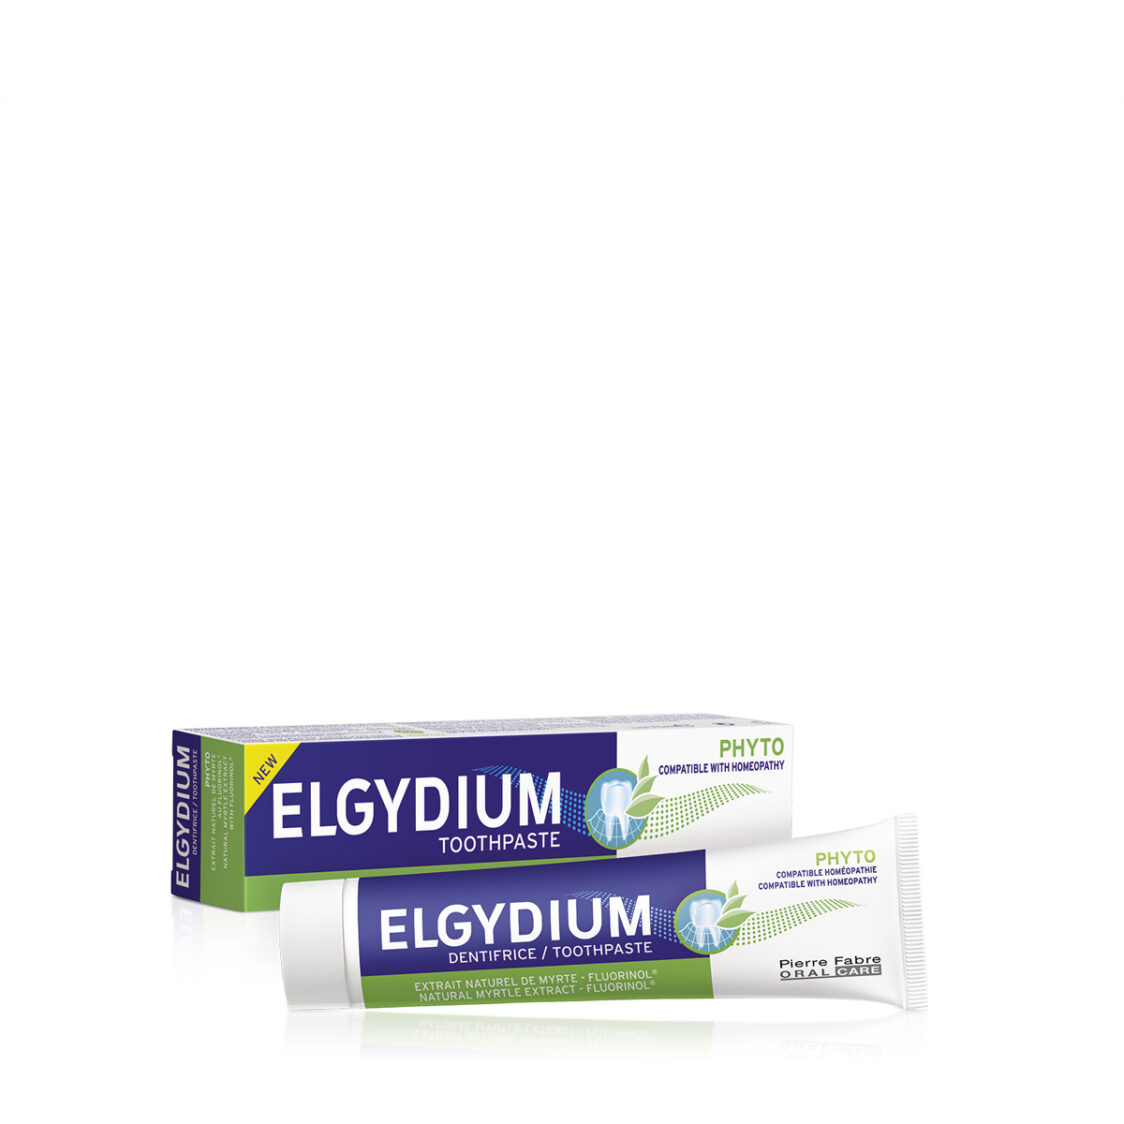 Elgydium Phyto Toothpaste 75ml